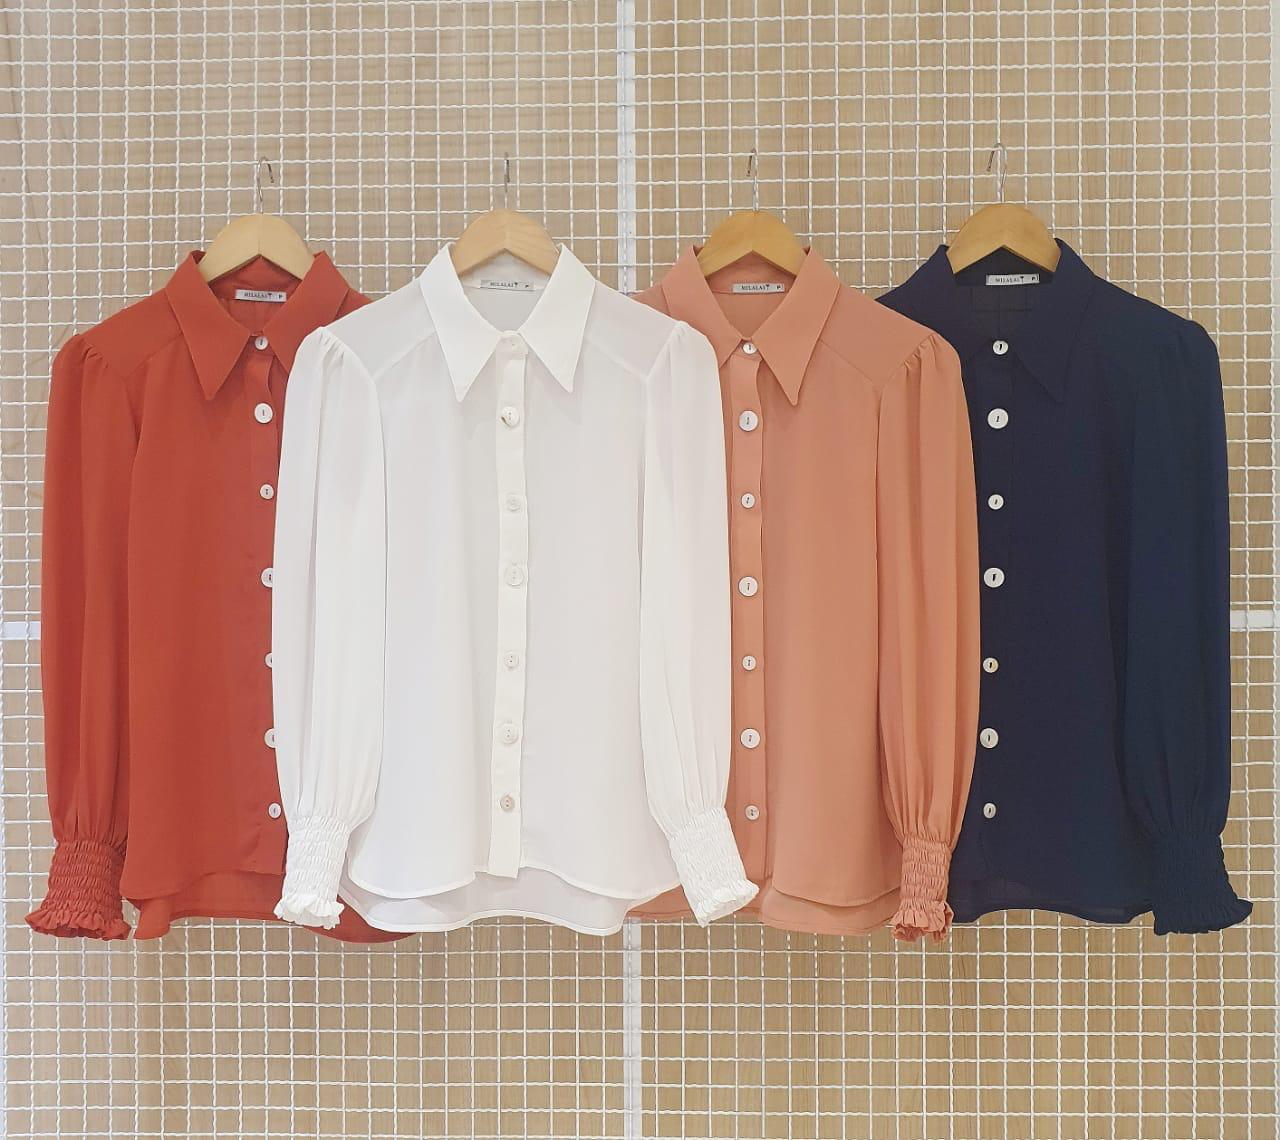 Camisa Milalai em Crepe com Mangas 34 e Botoes